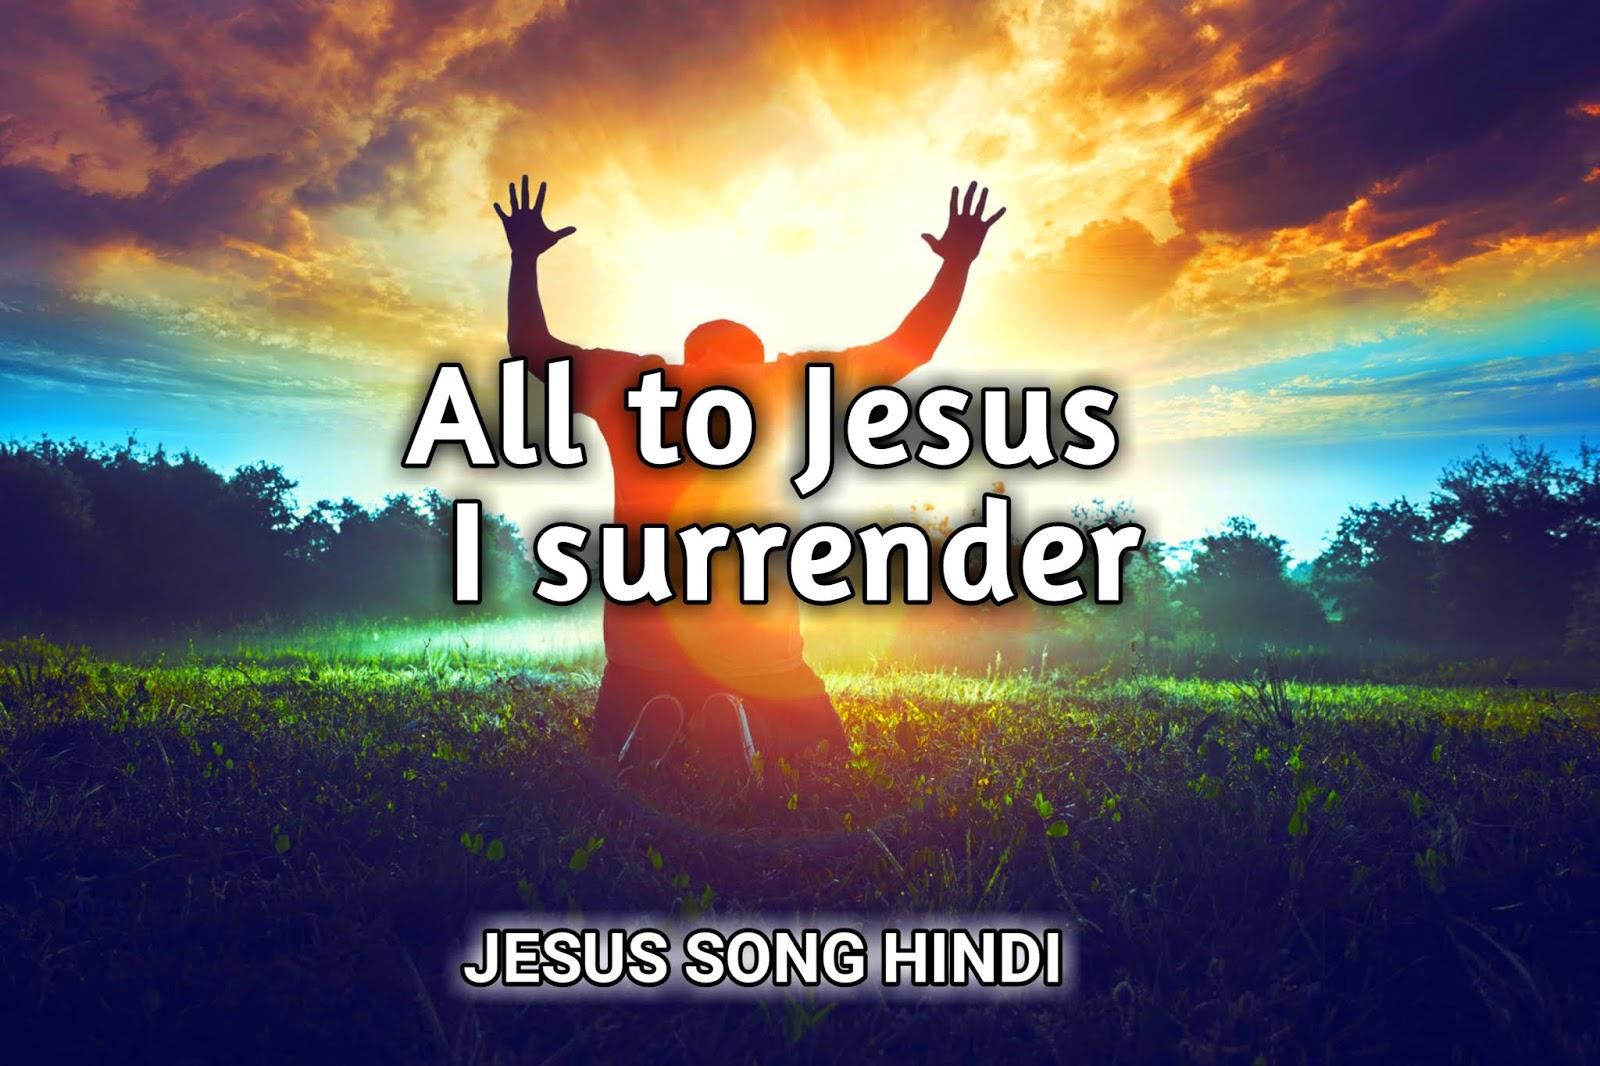 All To Jesus I Surrender Song Lyrics Jesus Song Hindi New hindi christian song lyrics 2020 | maine kabhi jana nahi ( मैंं ने कभी जाना नहीं ) rubina bk ft. all to jesus i surrender song lyrics